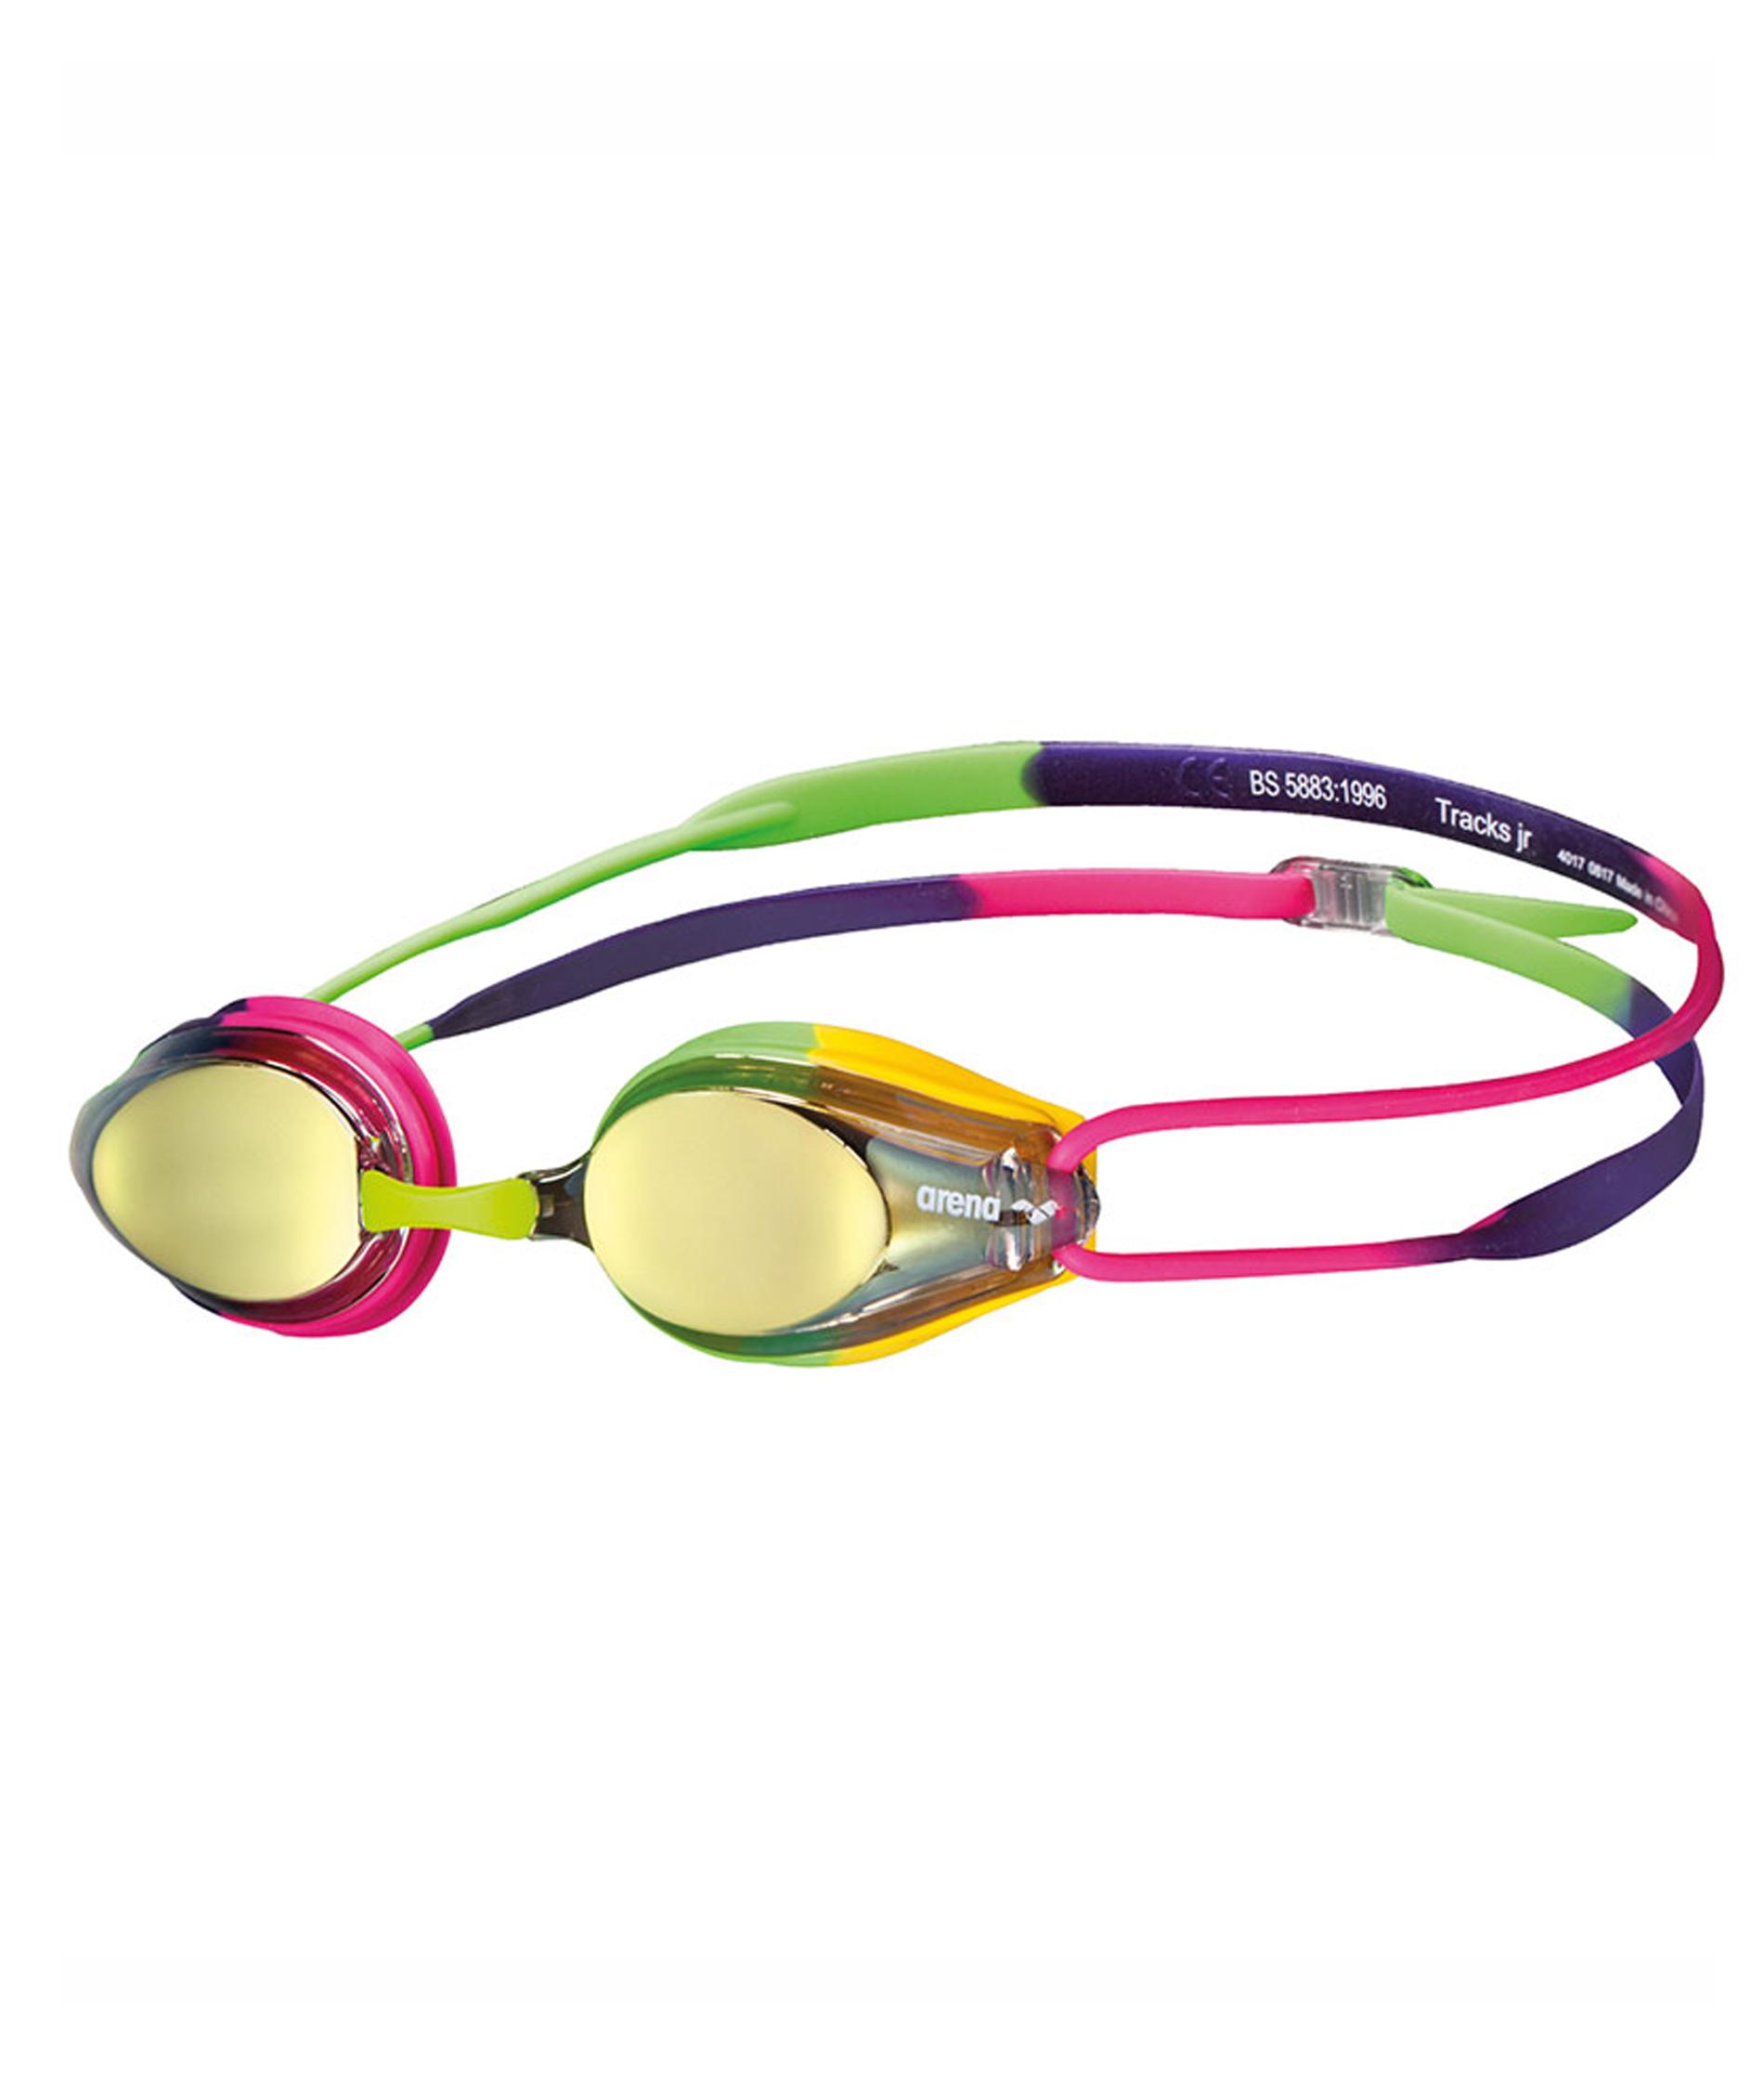 Arena Tracks Junior Mirror Goggles - Voilet/Fushia/Green